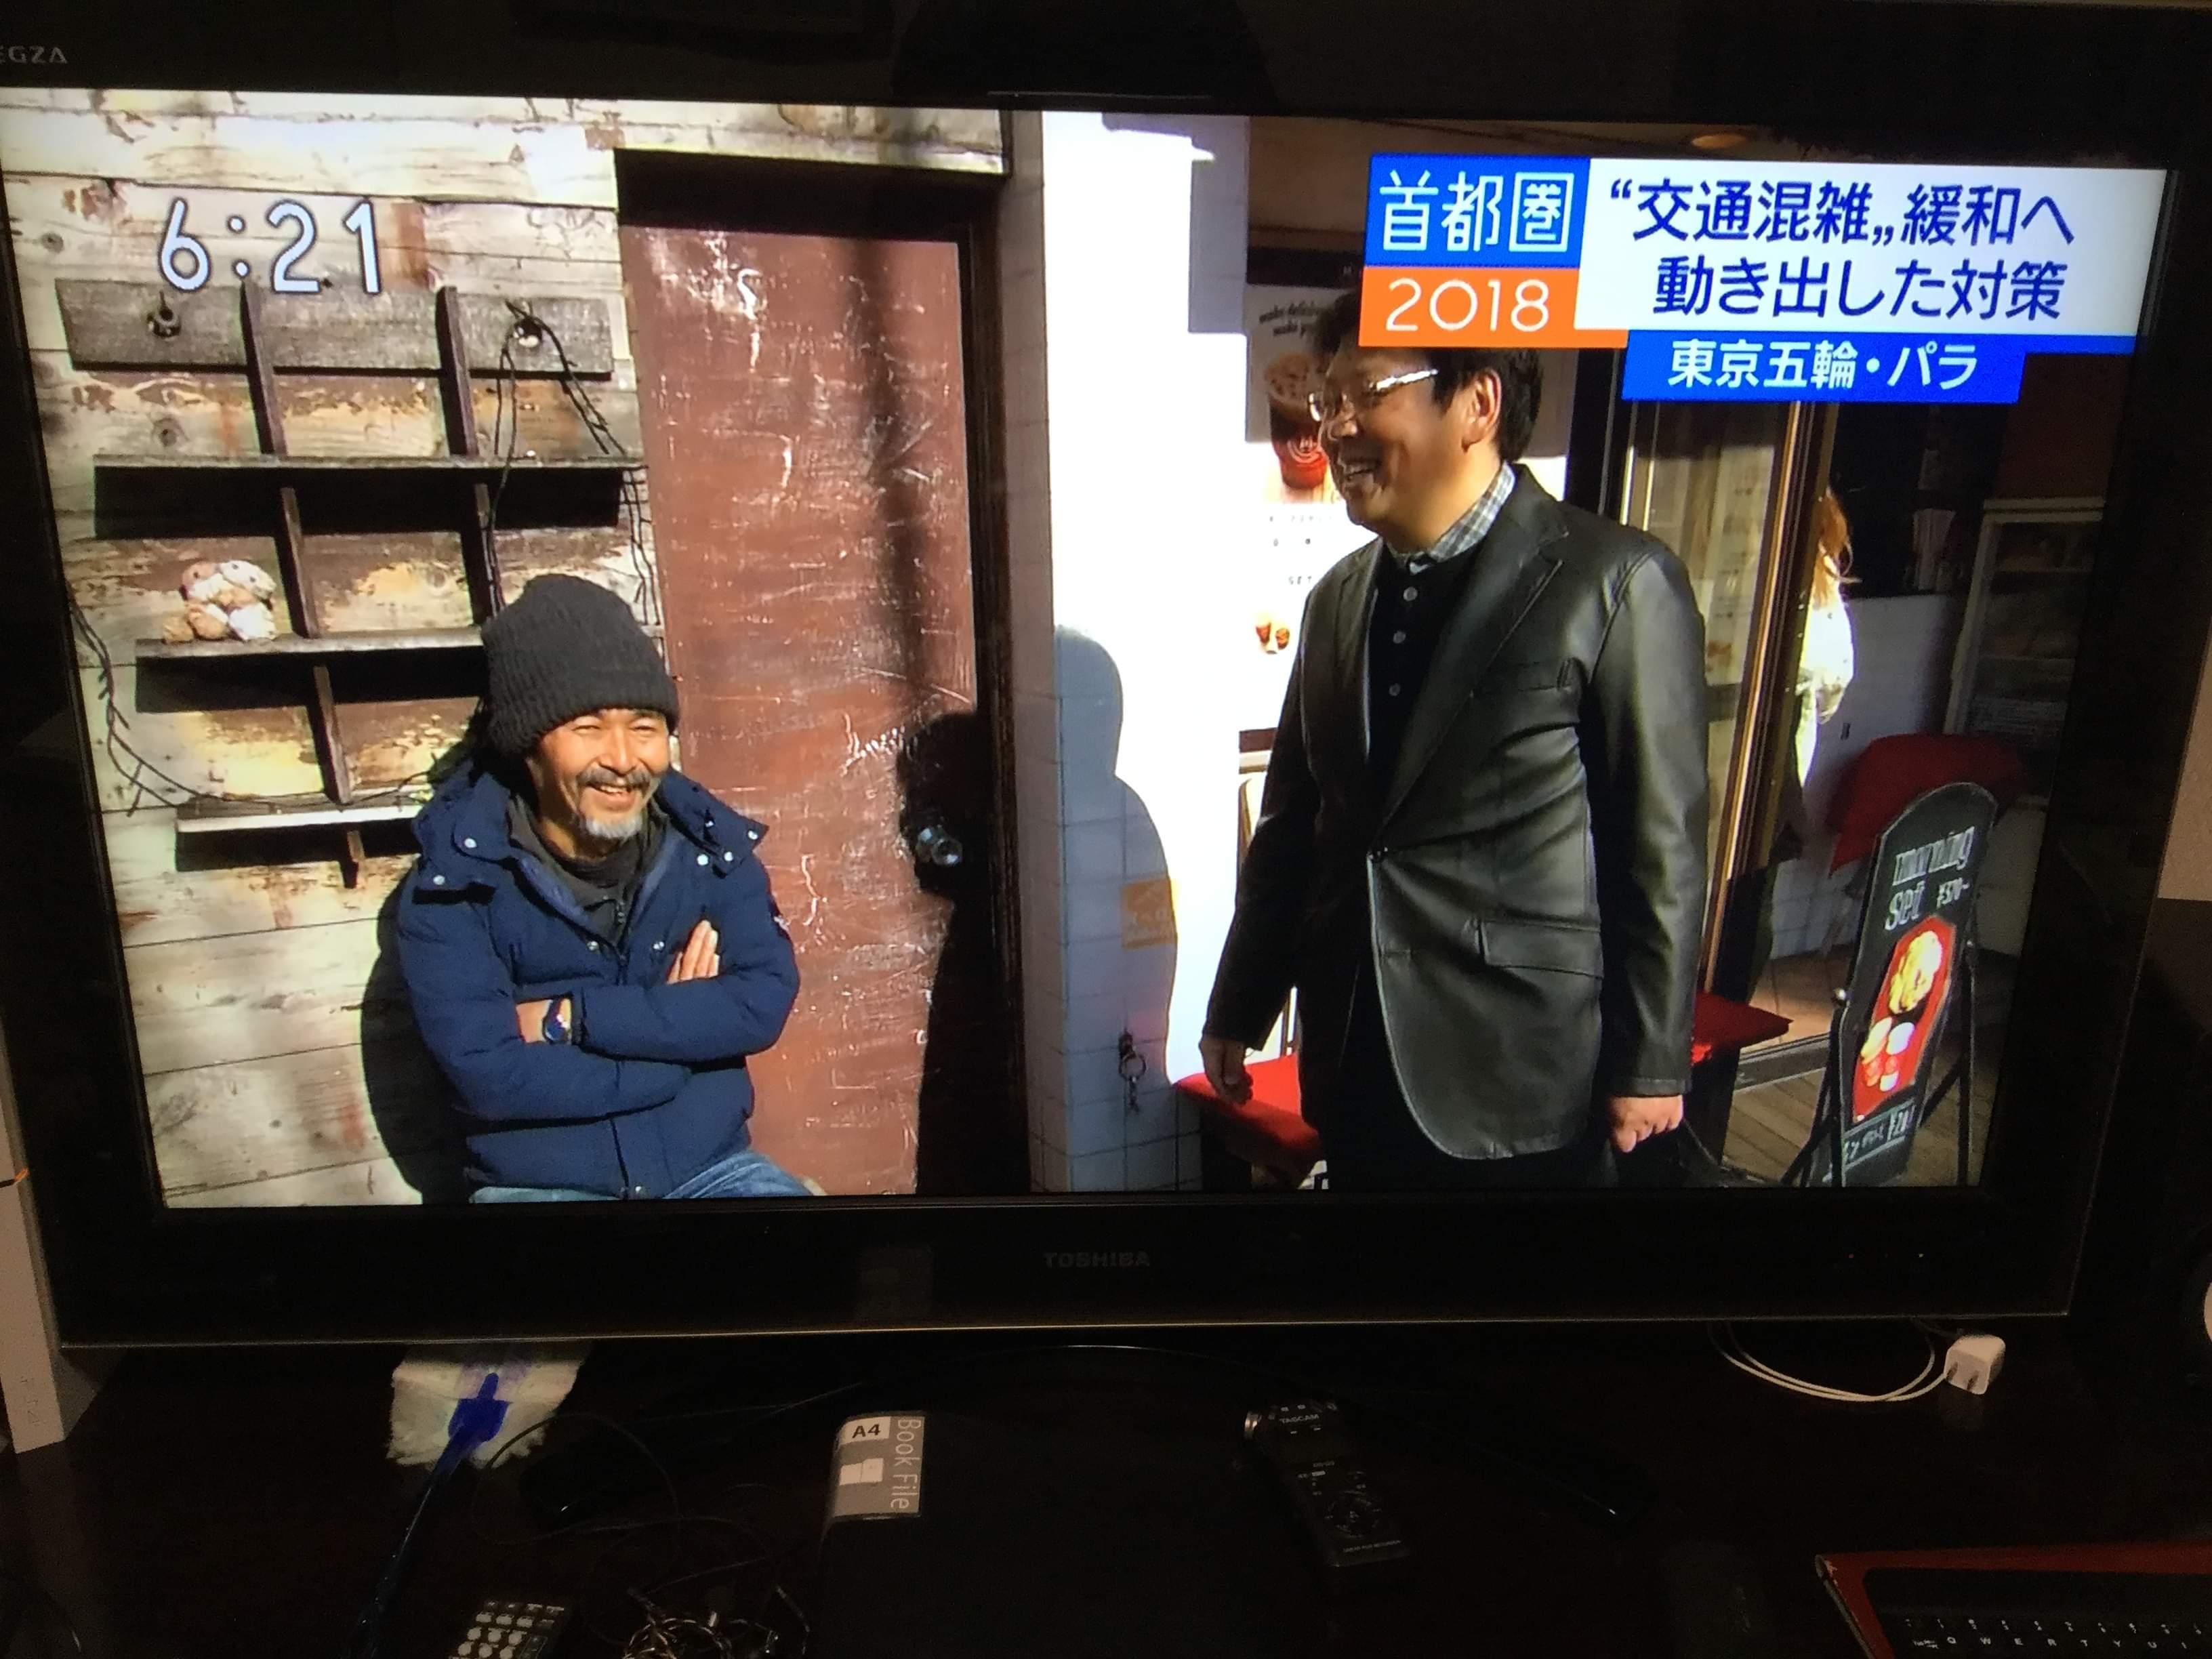 「NHKテレビまた一瞬でたよ」_a0075684_10059.jpg